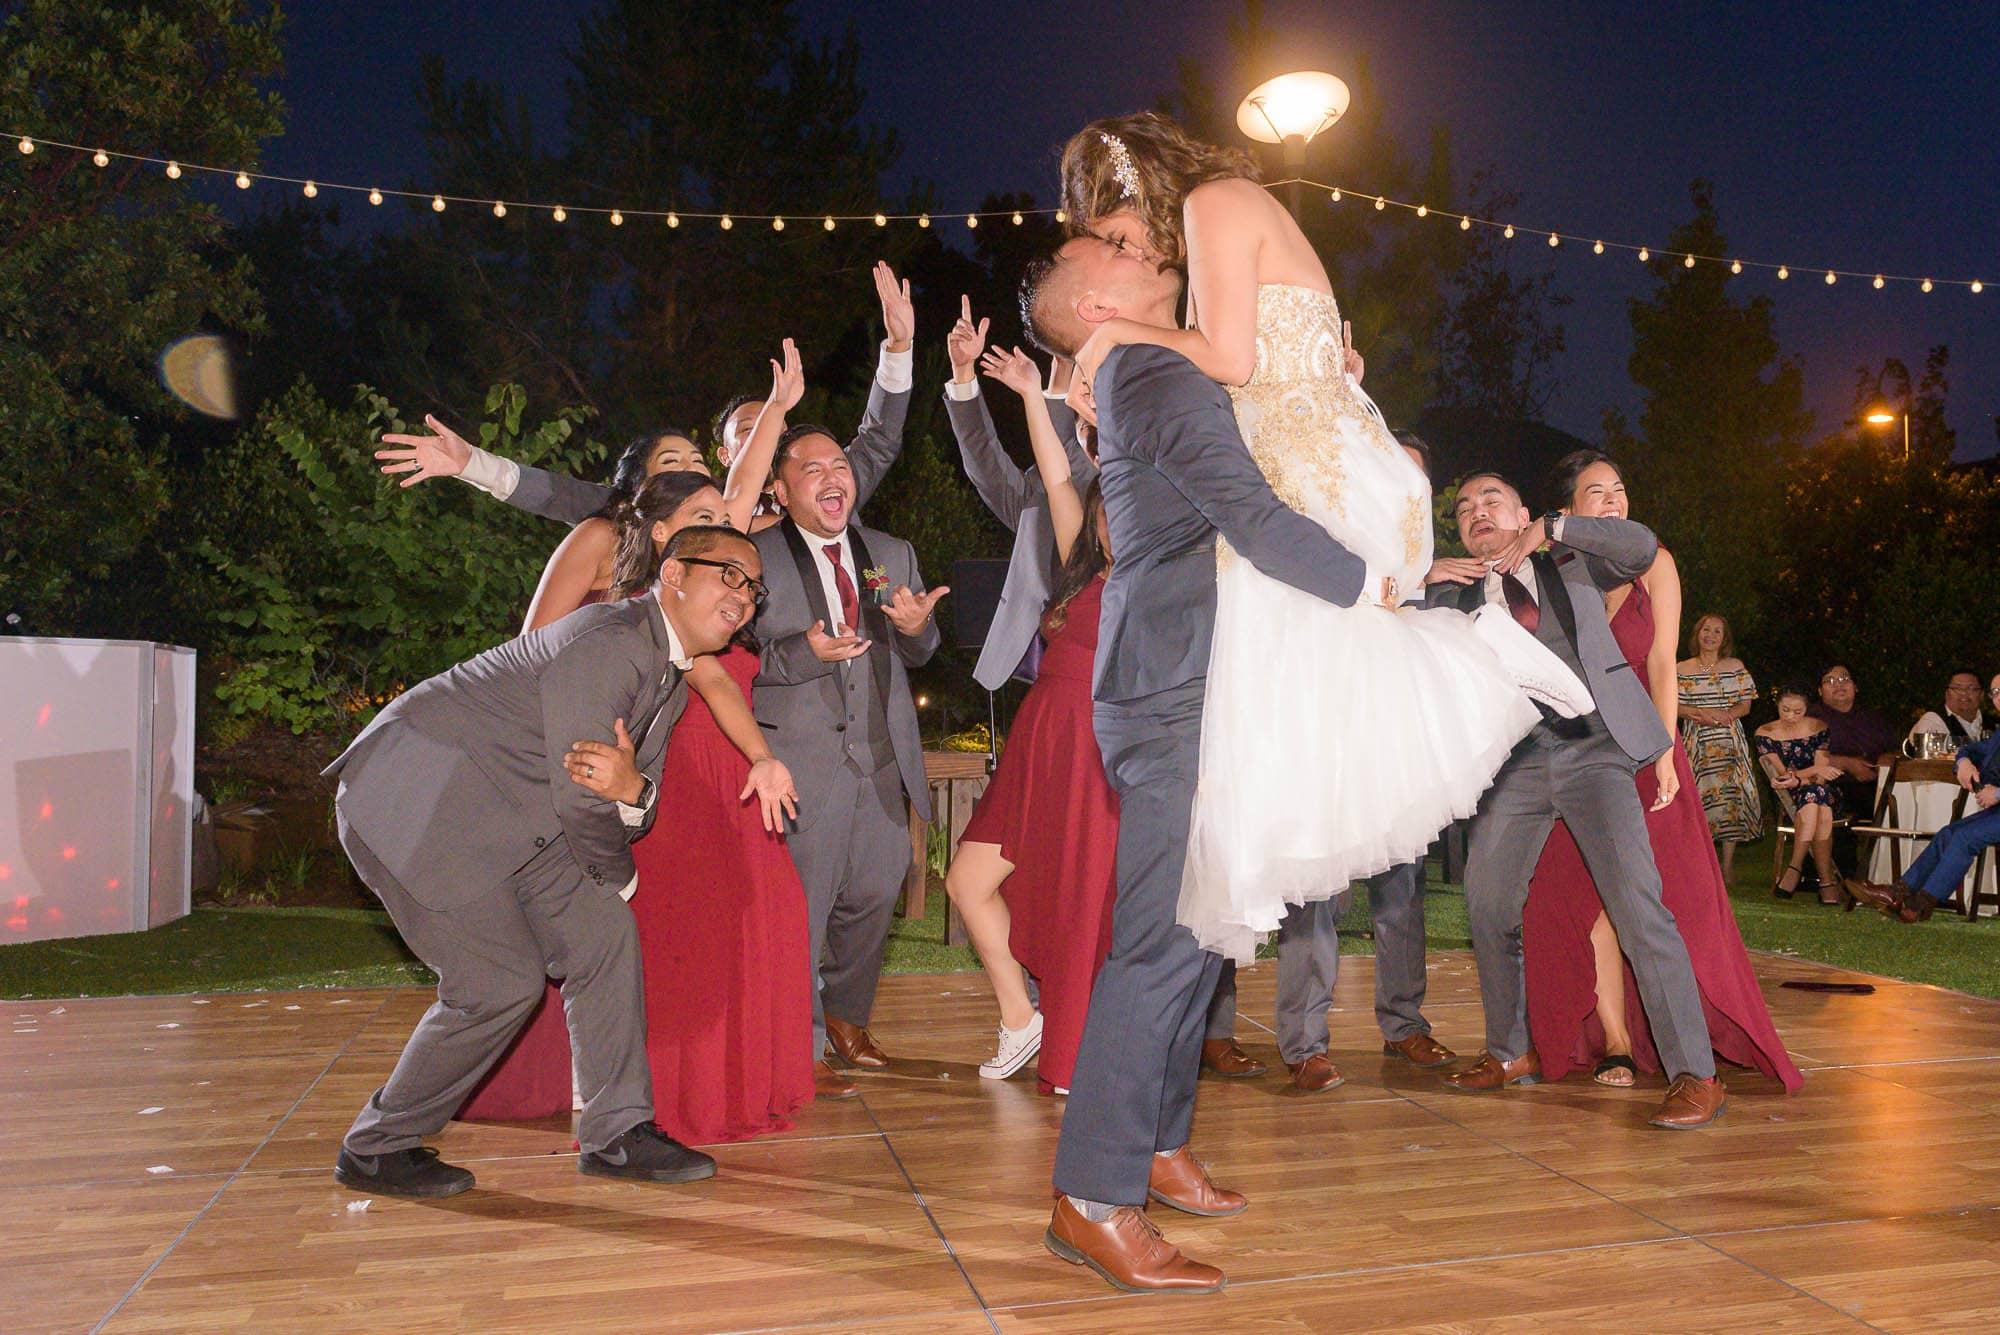 045_Alan_and_Heidi_Wedding_Karla_Paolo